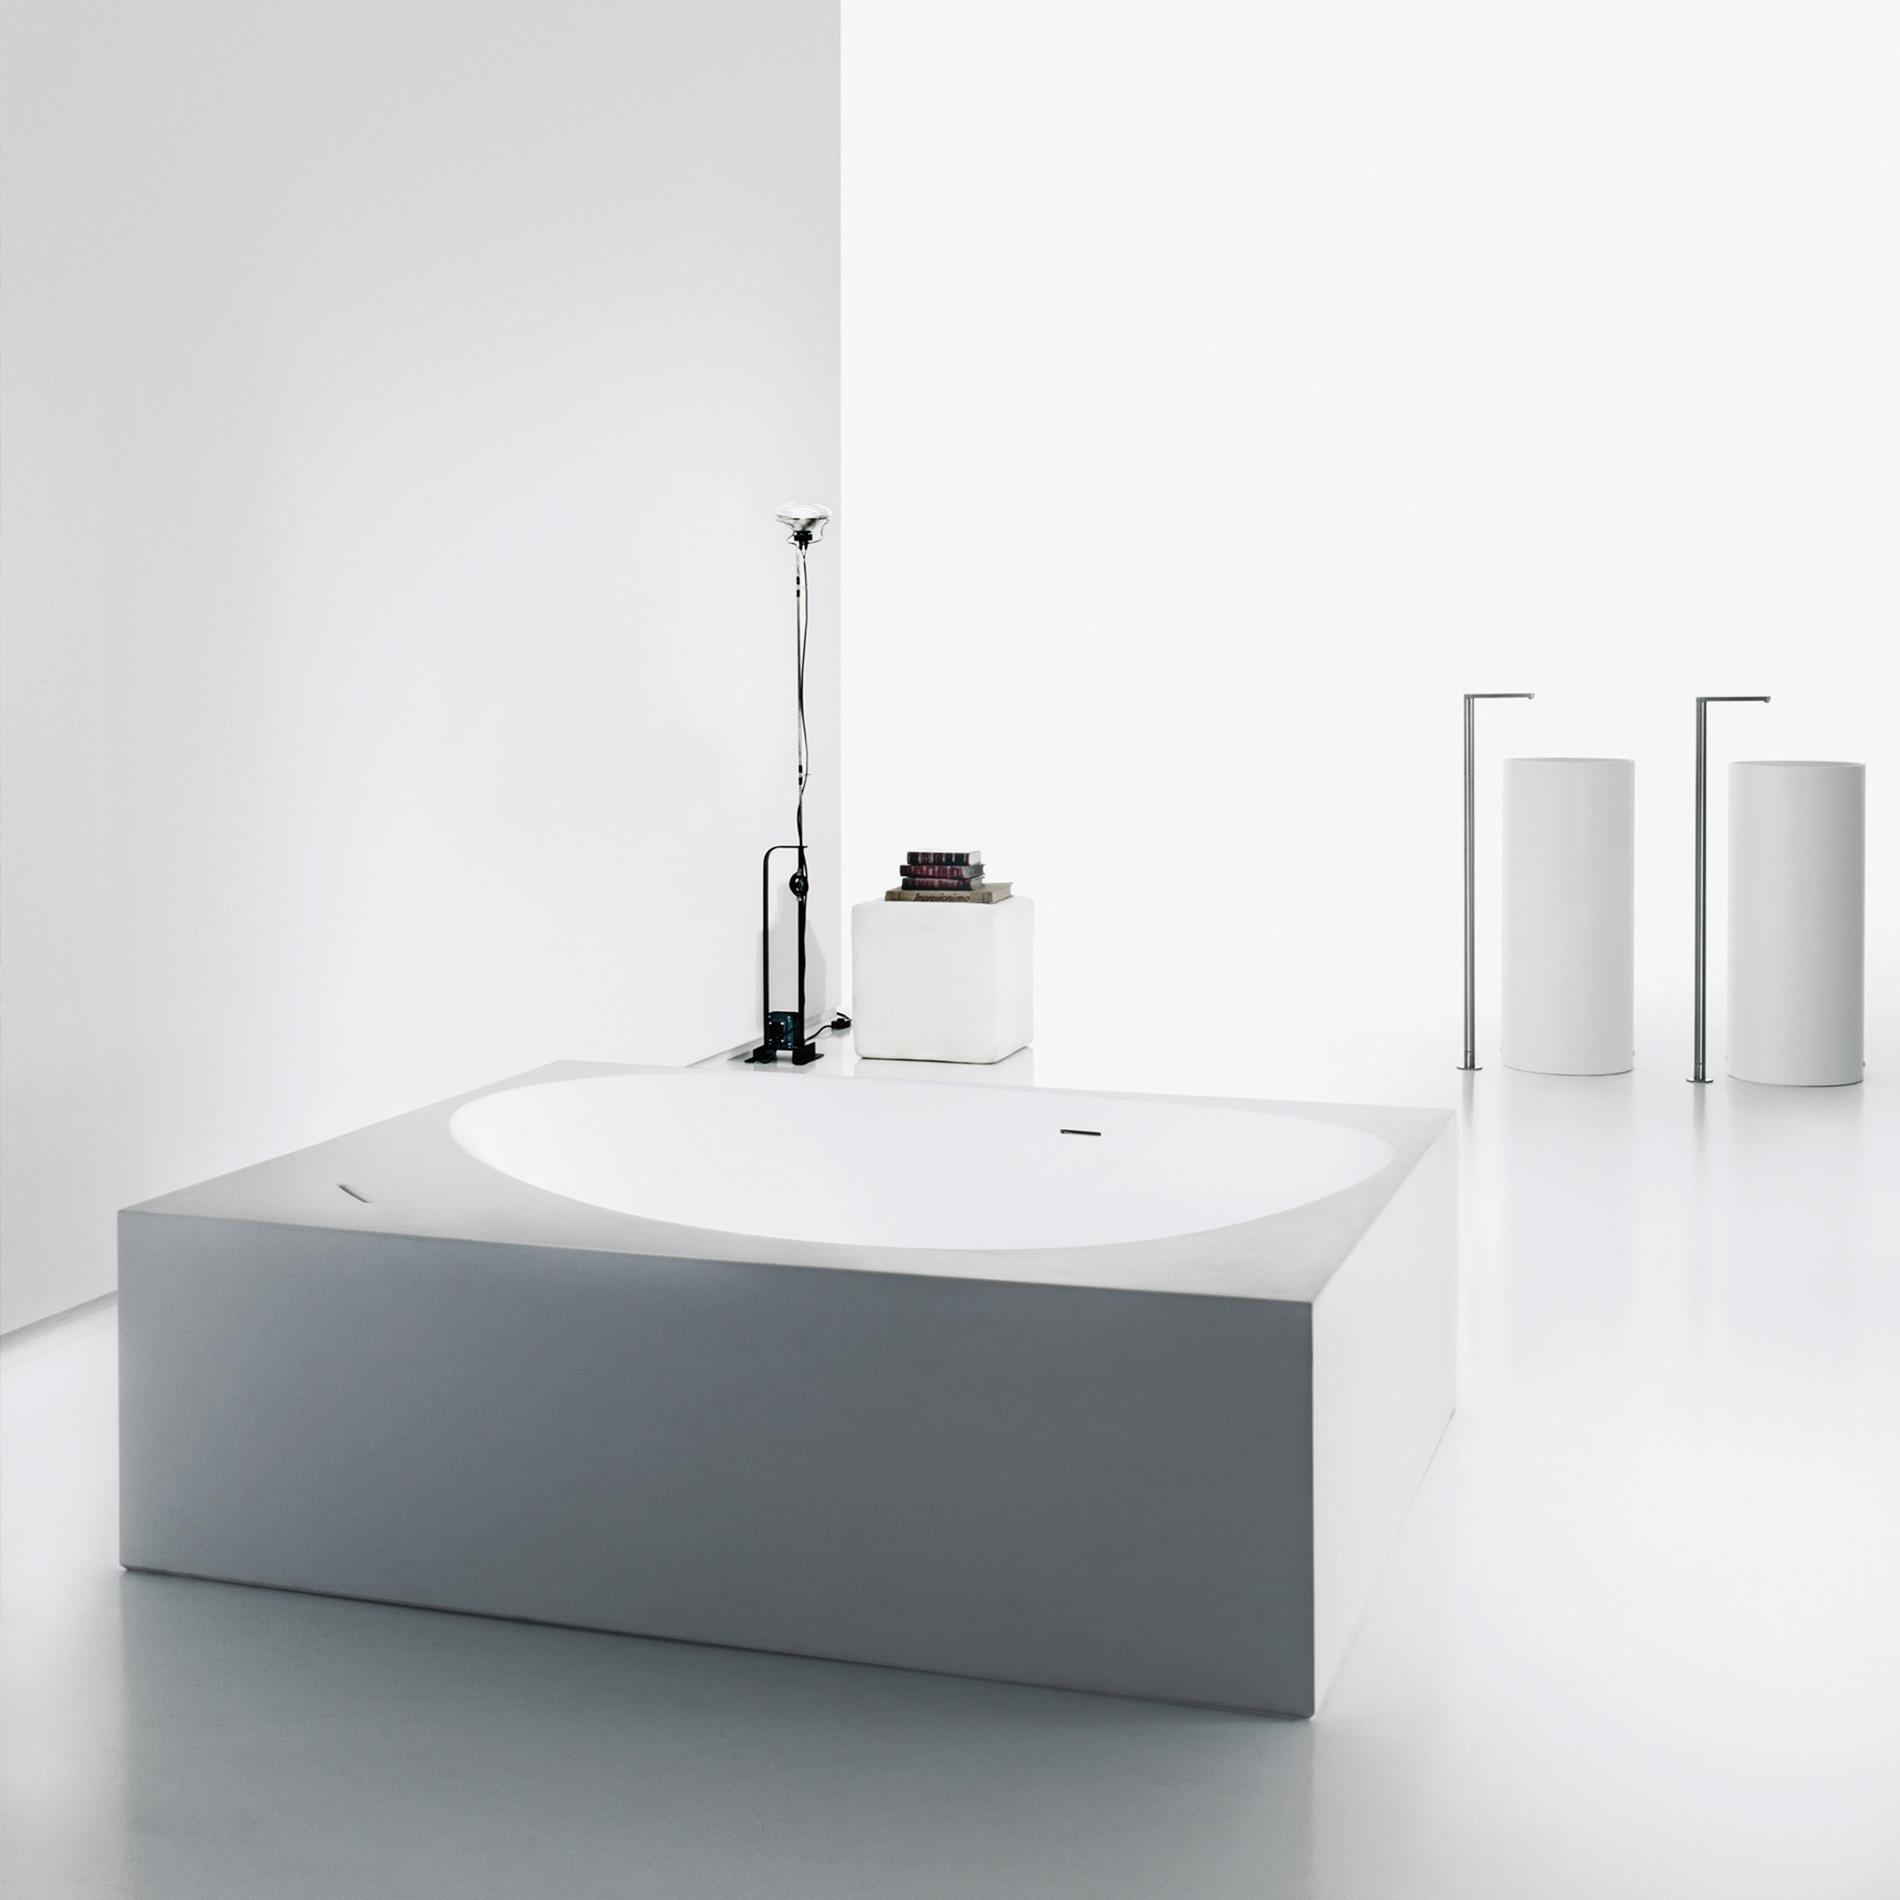 Nicos-International-home-products-Boffi-tub-1